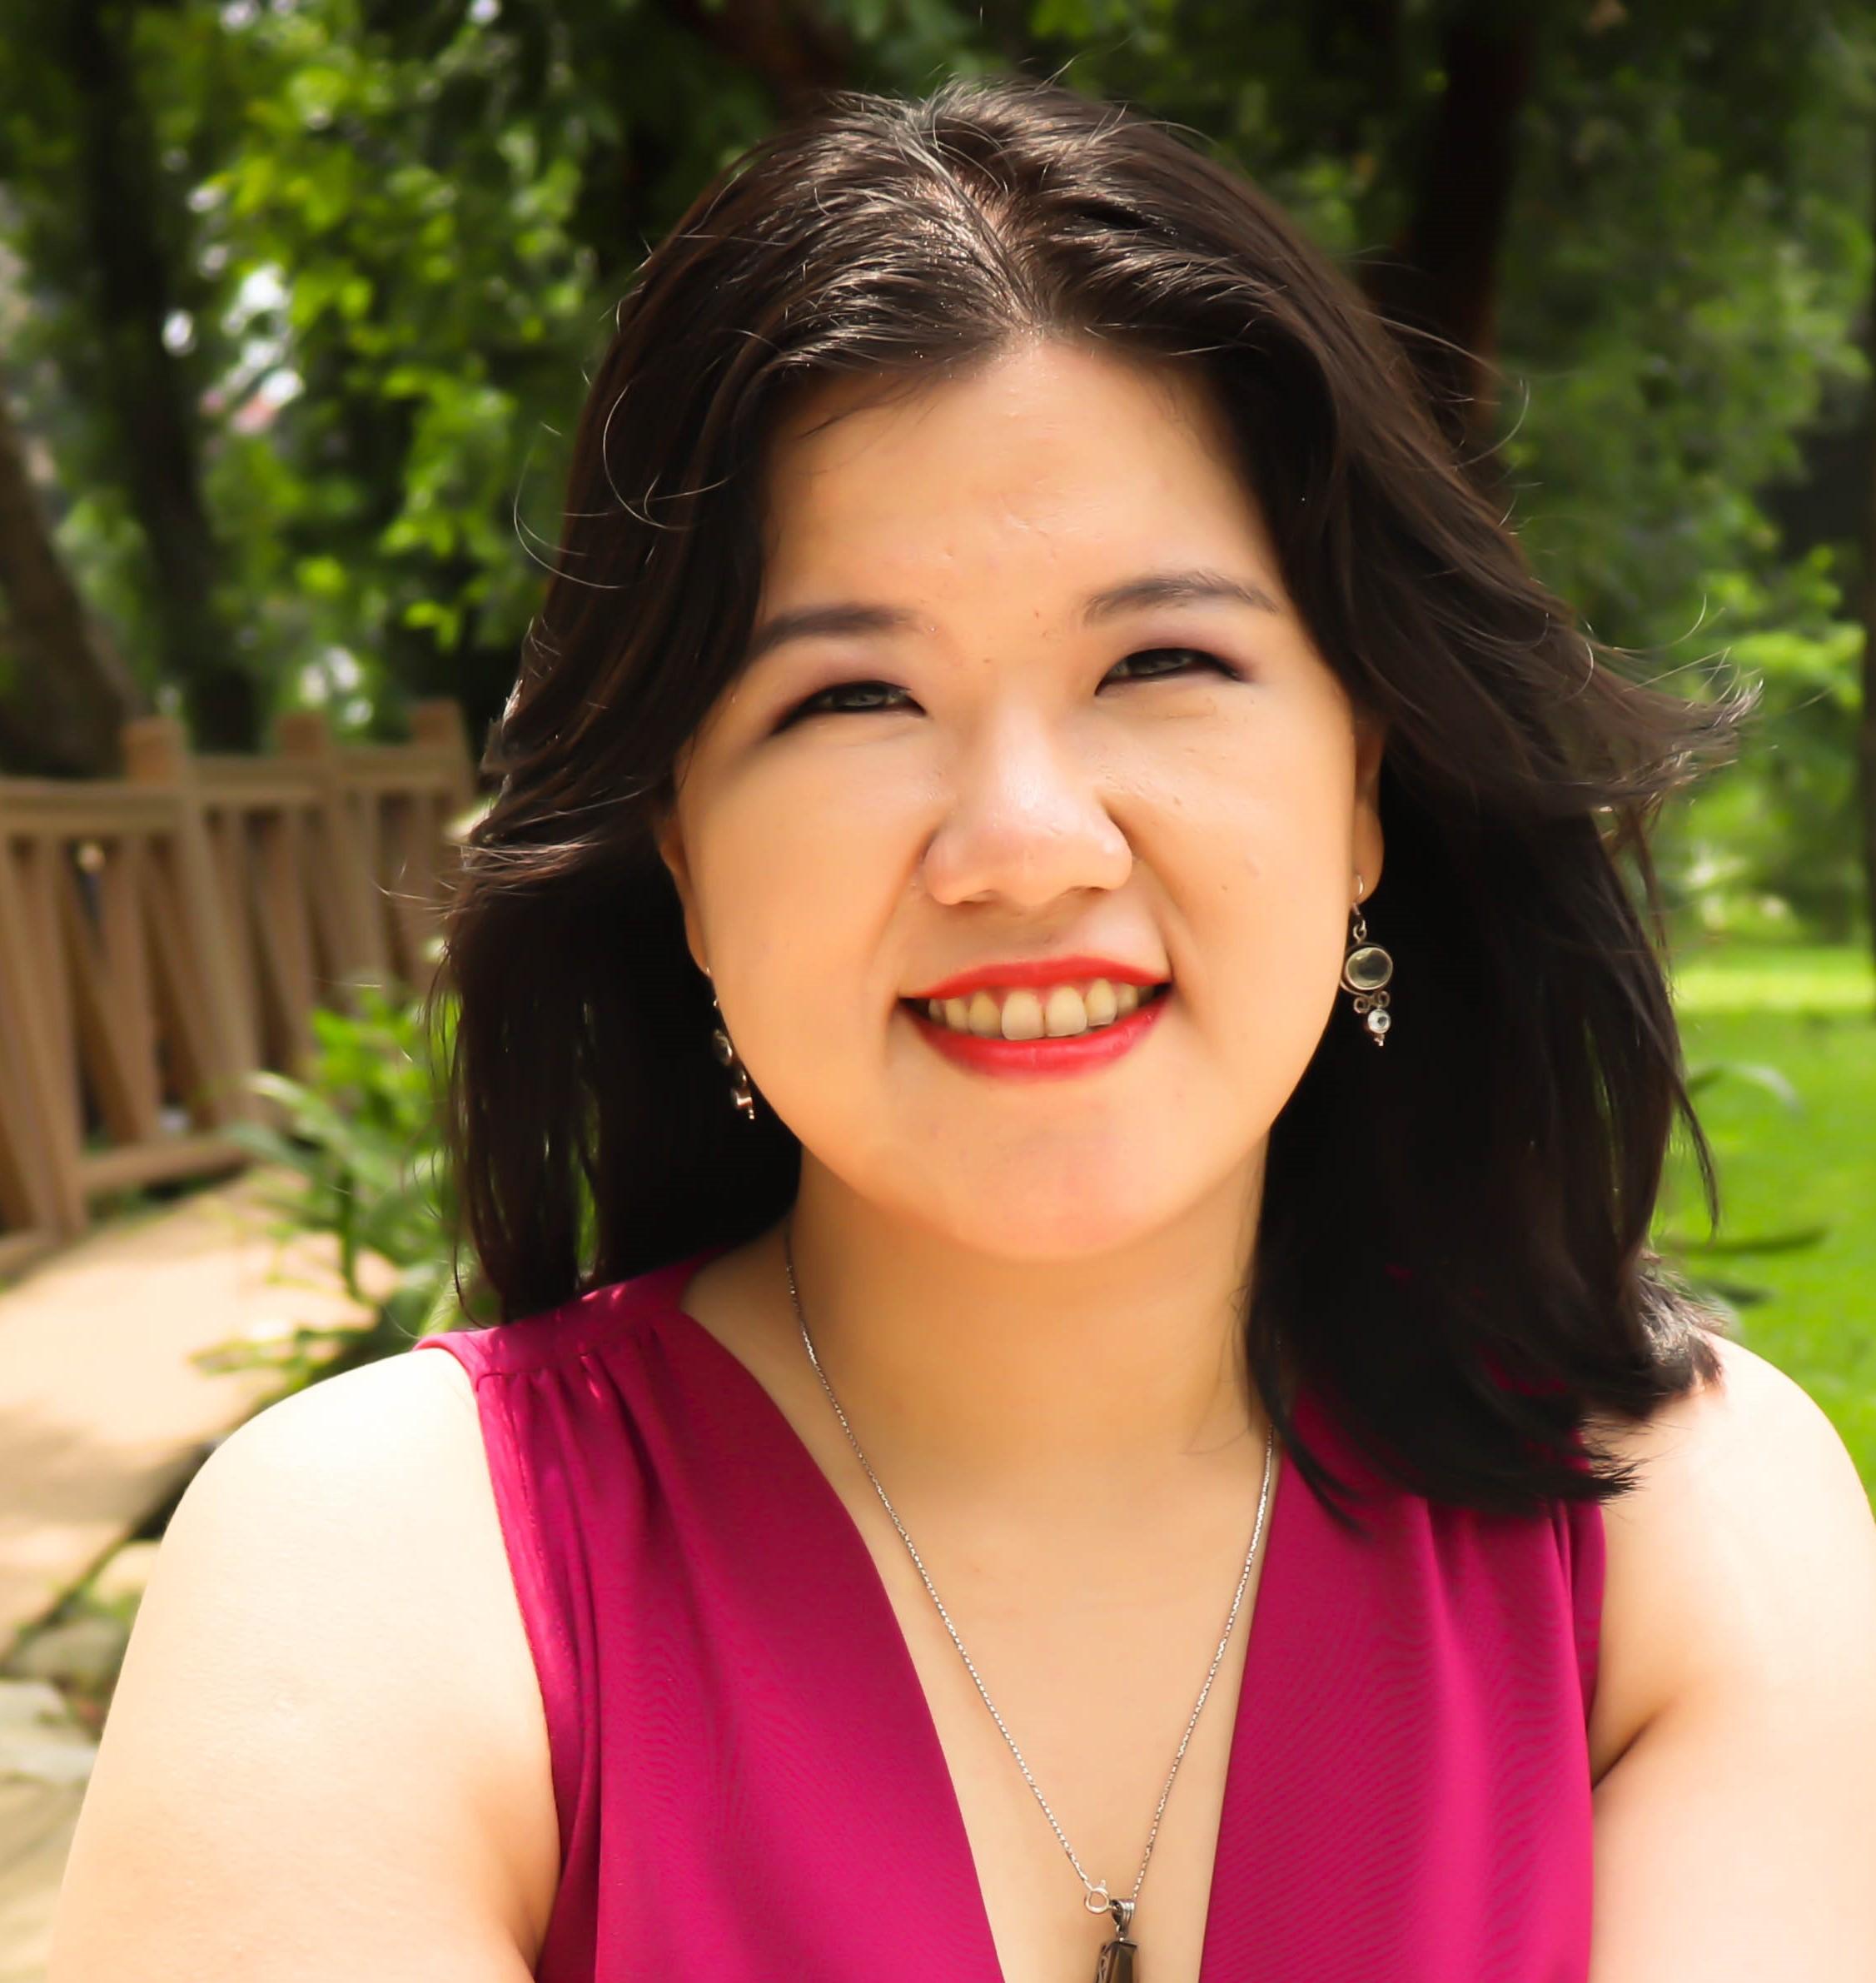 Maria Tan Success Coach - Self Care For Bosses Tips